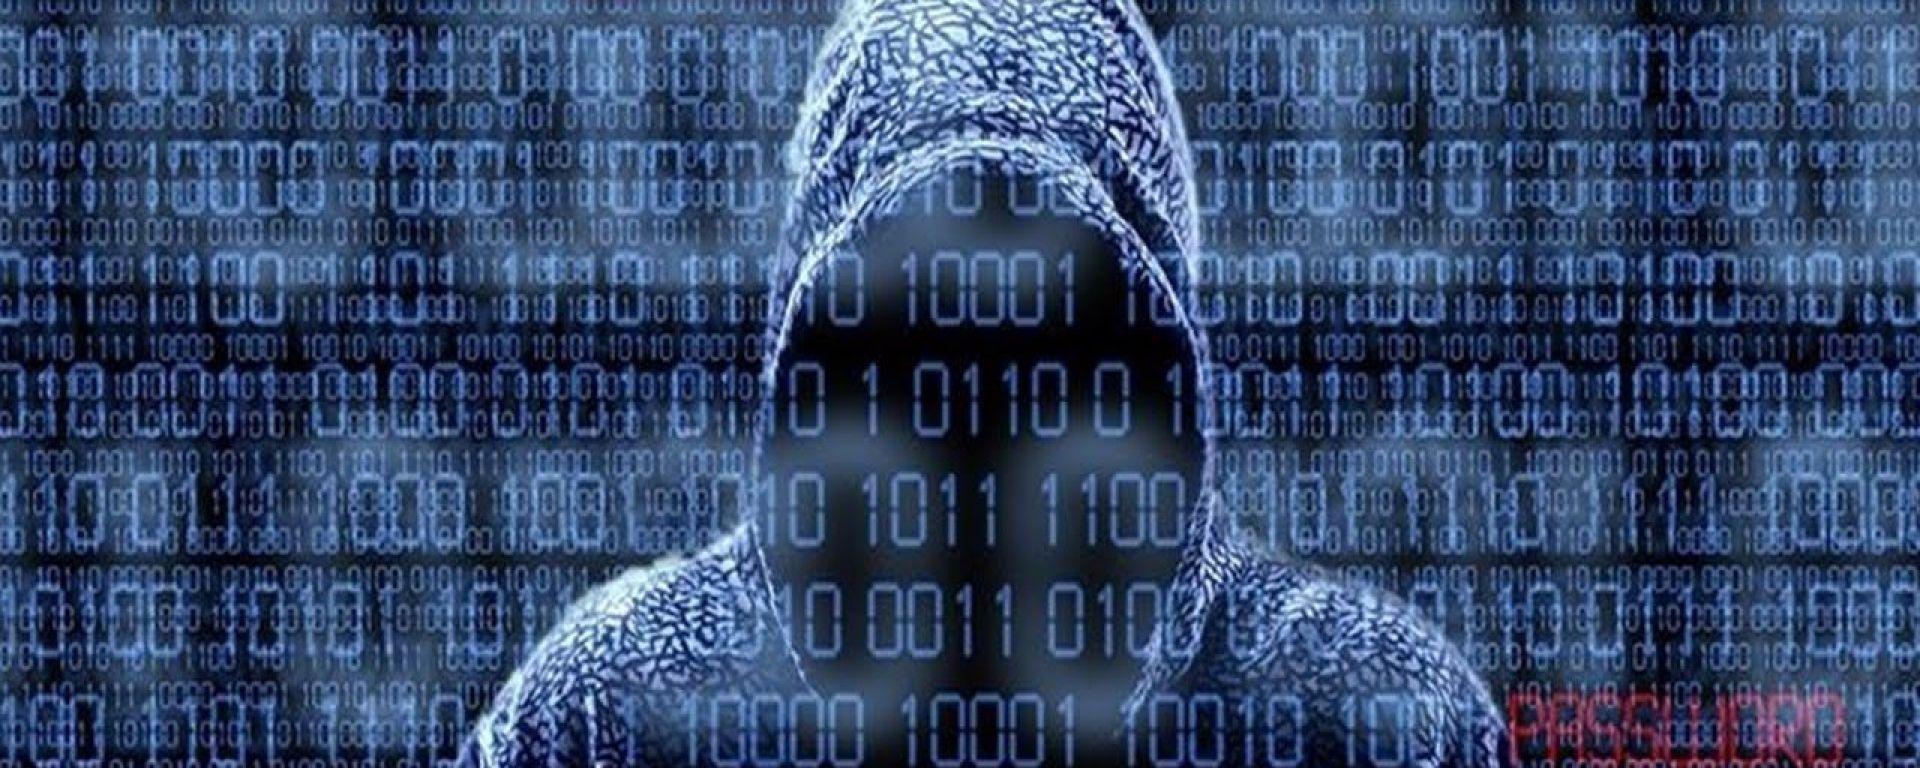 Il rischio hacker preoccupa i big: da Jeep a Nissan, da Tesla a Toyota. Persino l'FBI